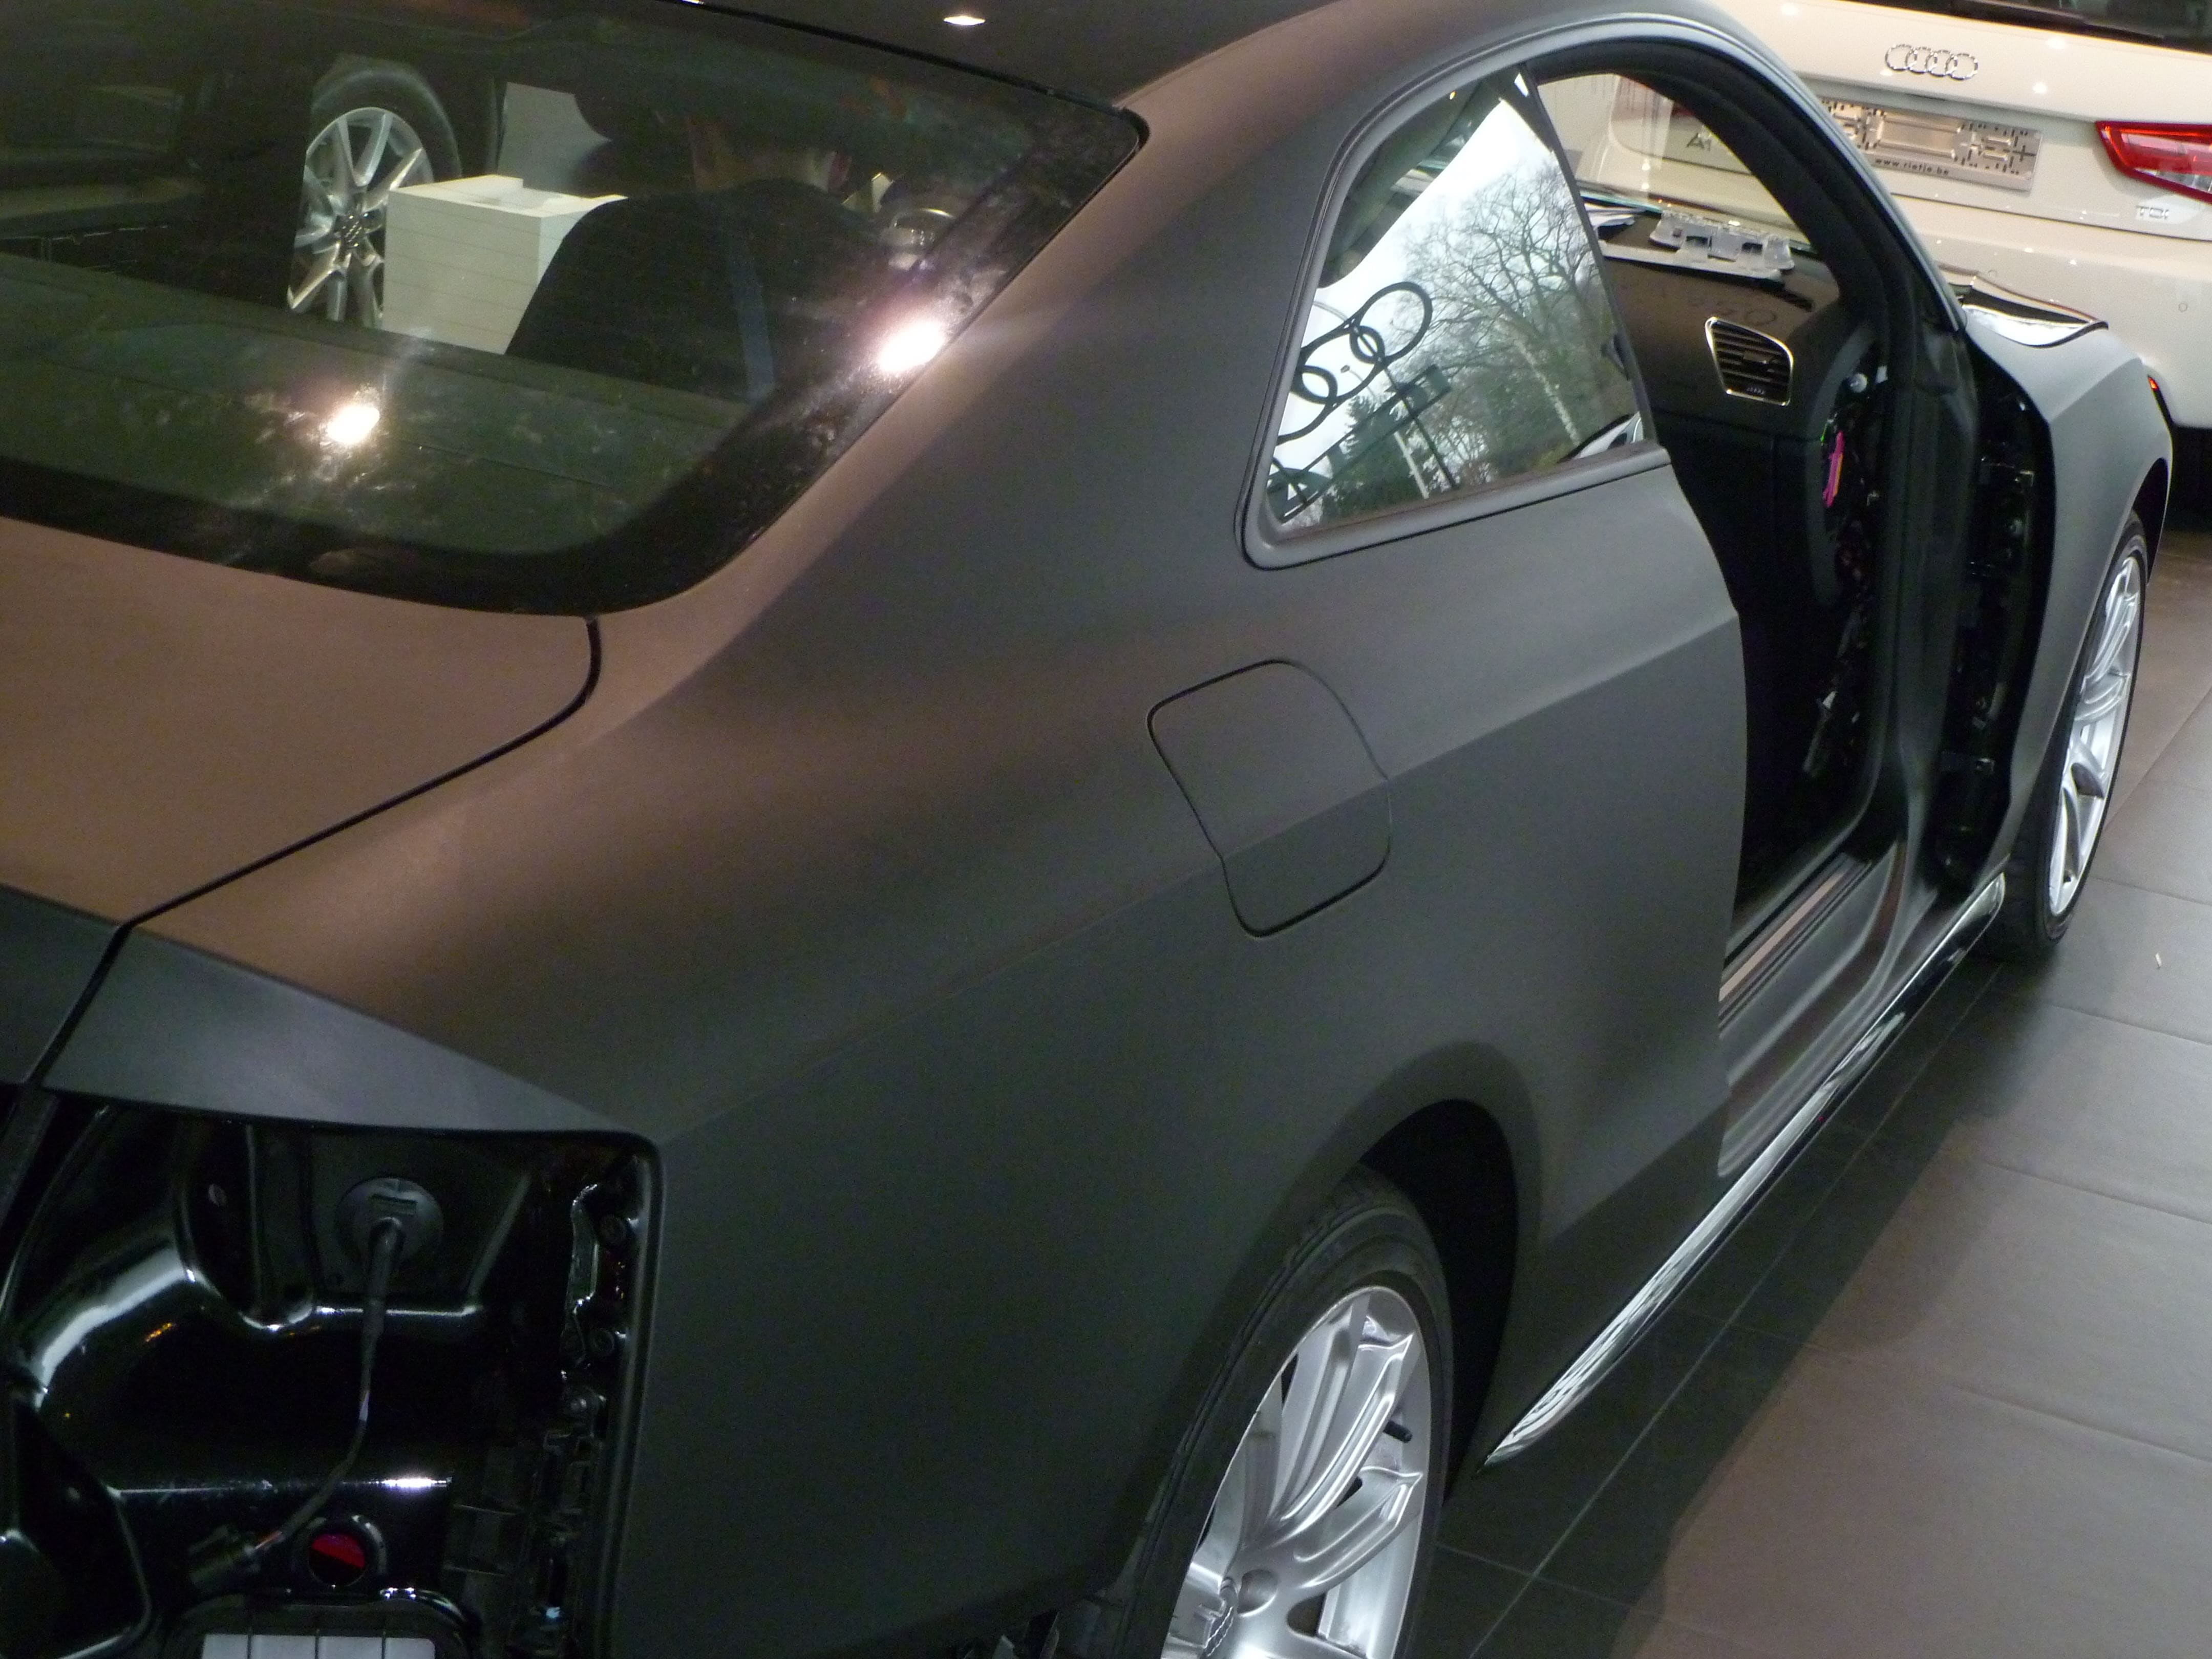 Audi A5 Coupe met Mat Zwarte Wrap, Carwrapping door Wrapmyride.nu Foto-nr:4624, ©2021